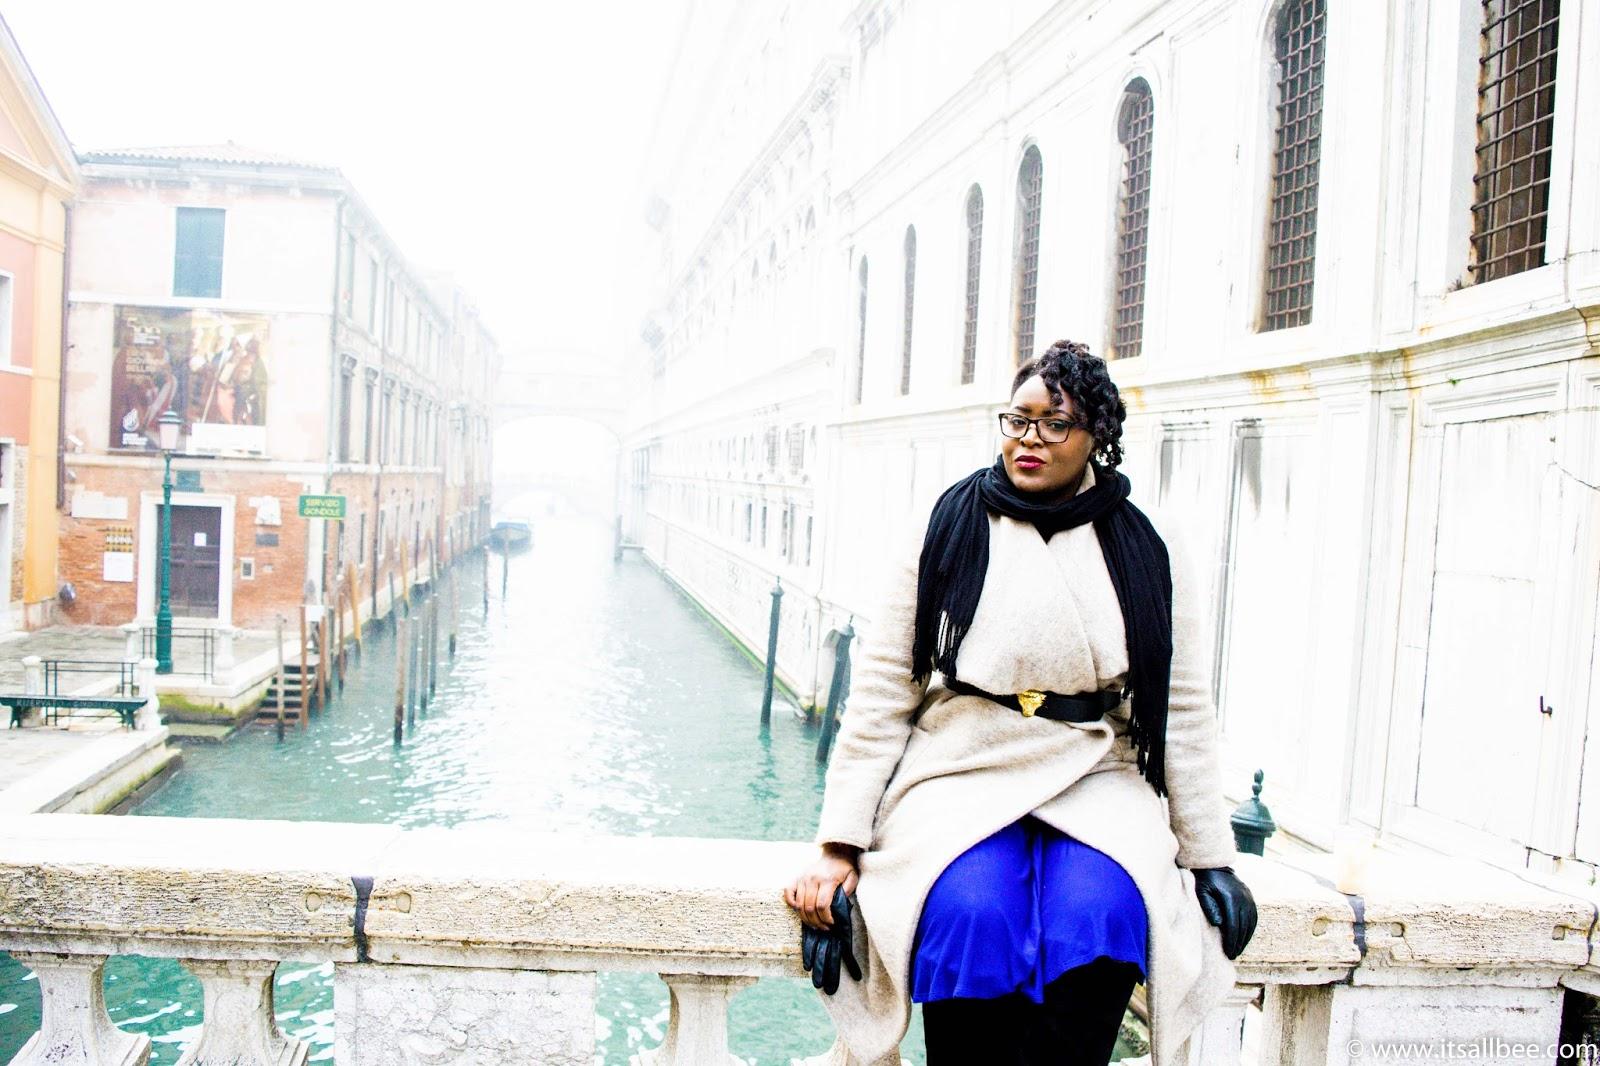 Venice In December | Bridge of sighs